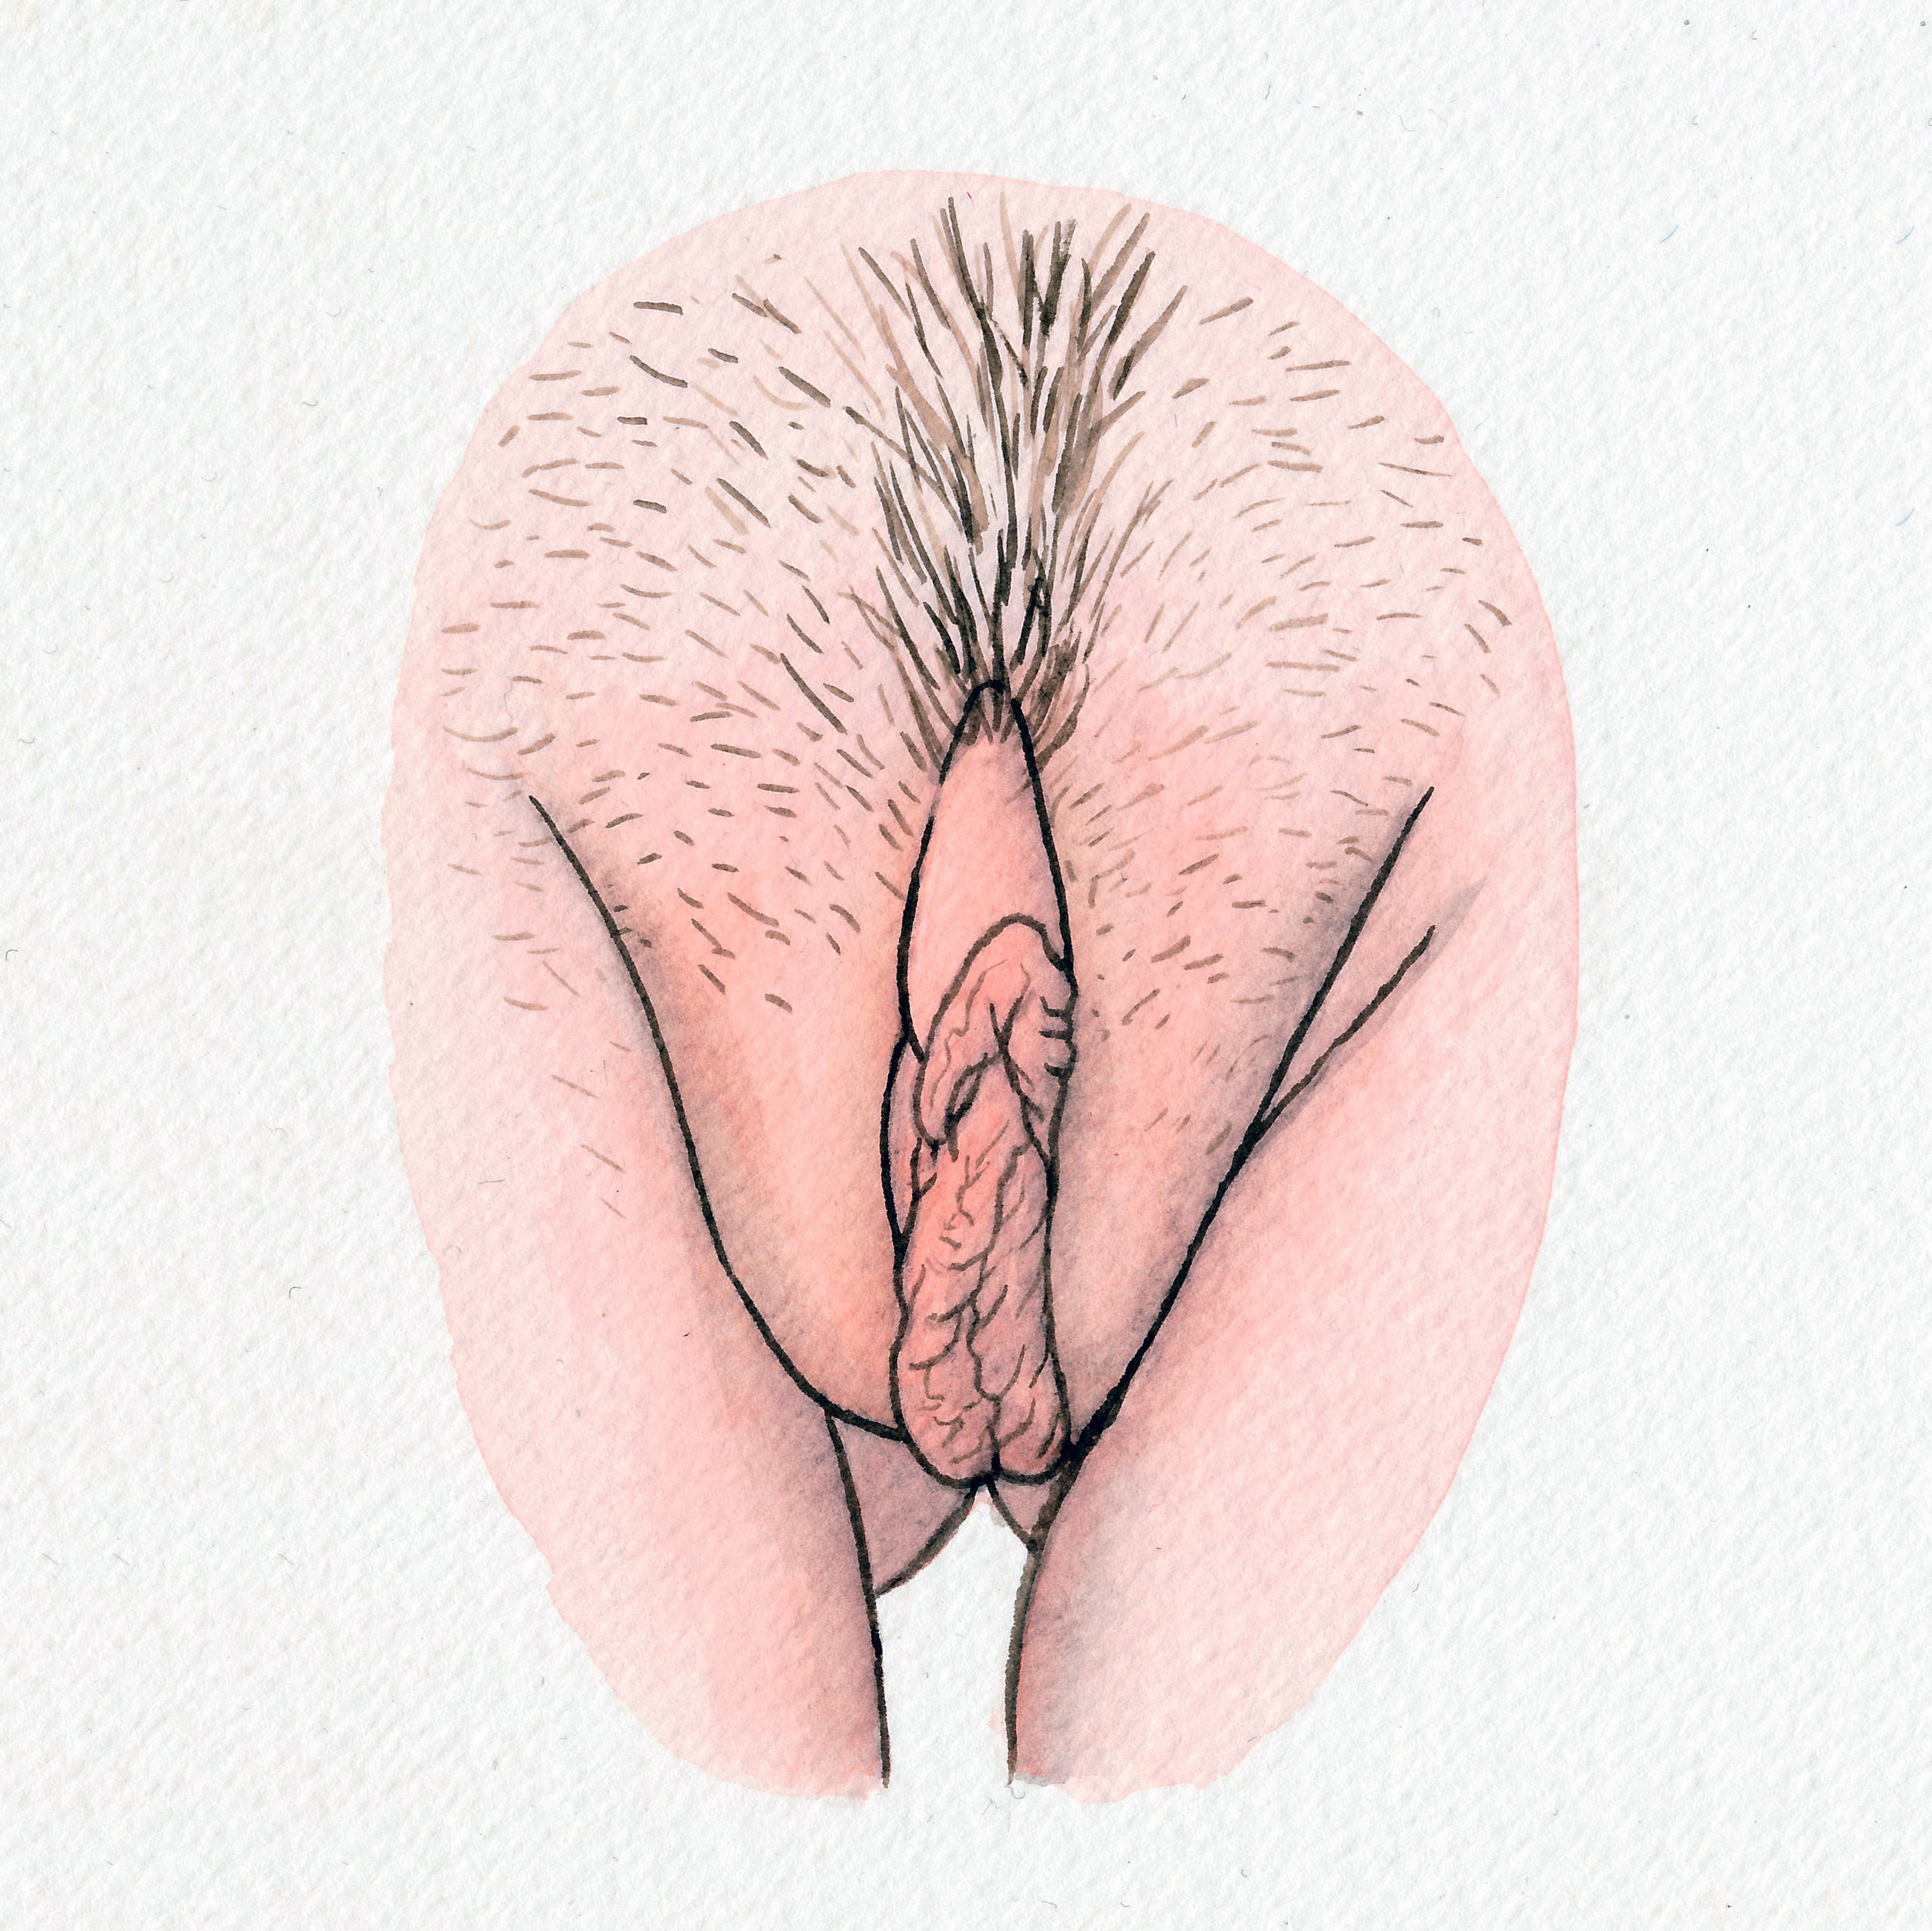 The Vulva Gallery - Vulva Portrait #118 (s).jpg